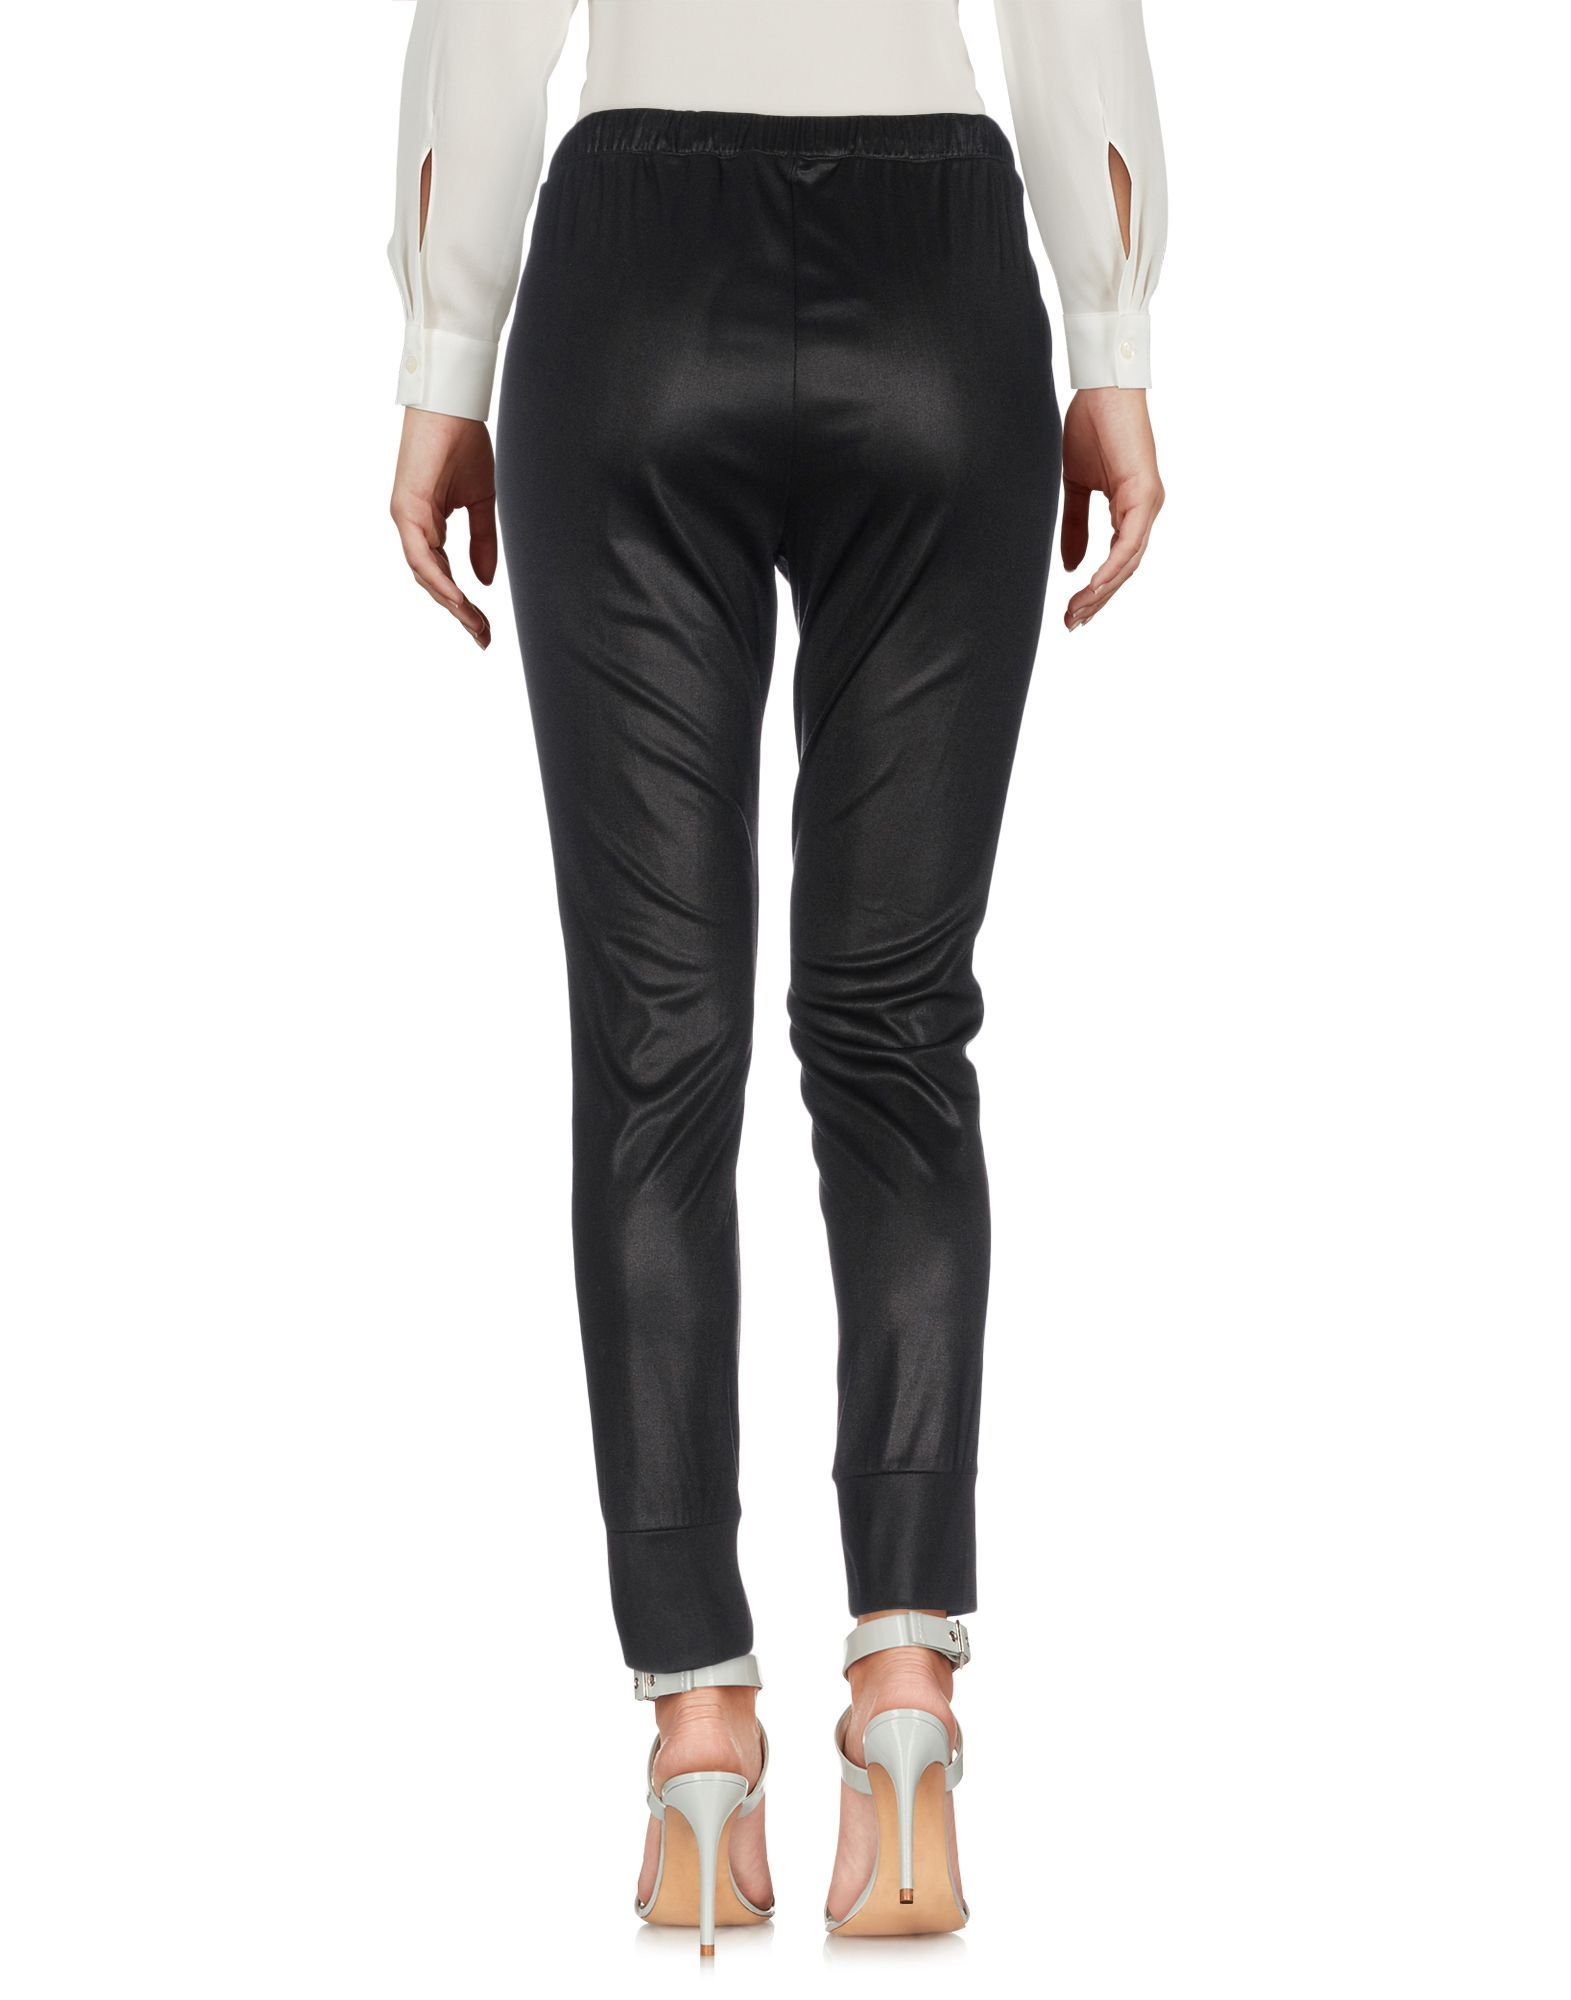 Liu Jo Black Trousers